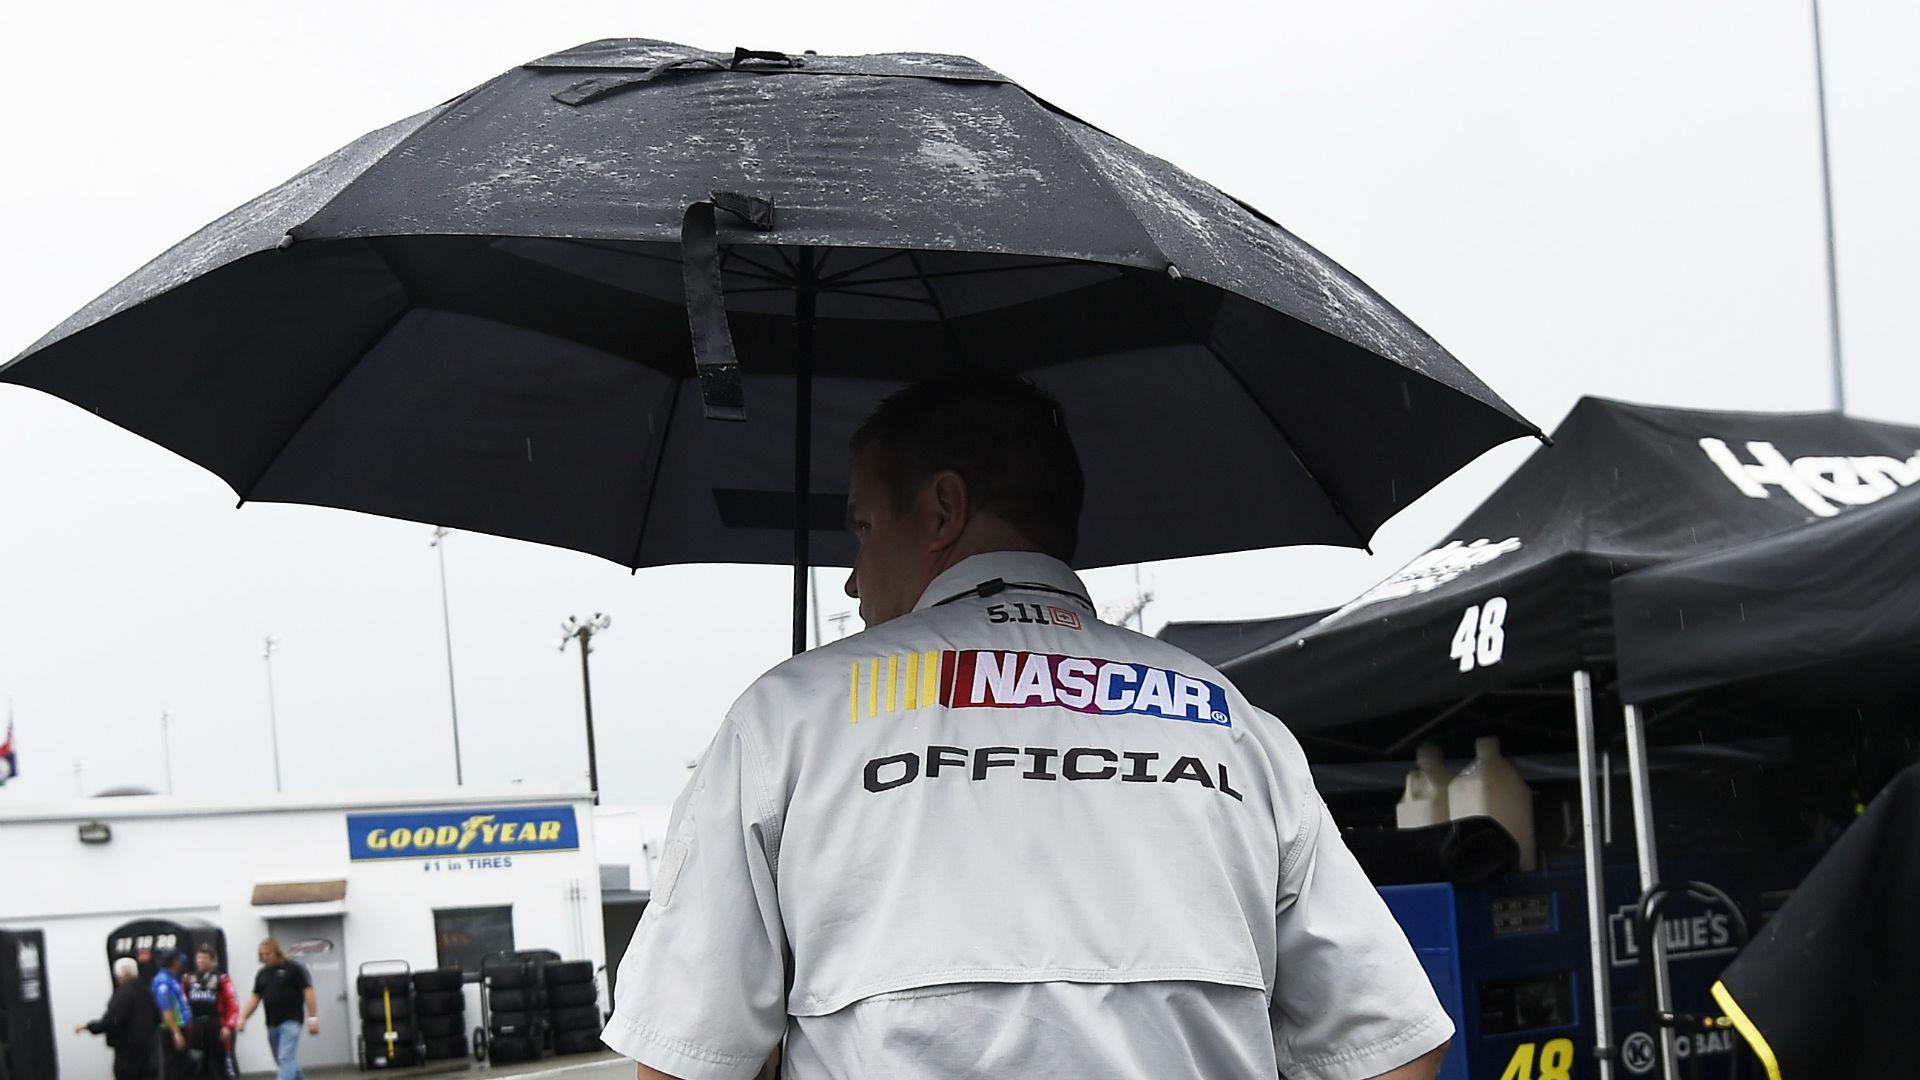 NASCAR at Bristol: Rain postpones Food City 500 until Monday